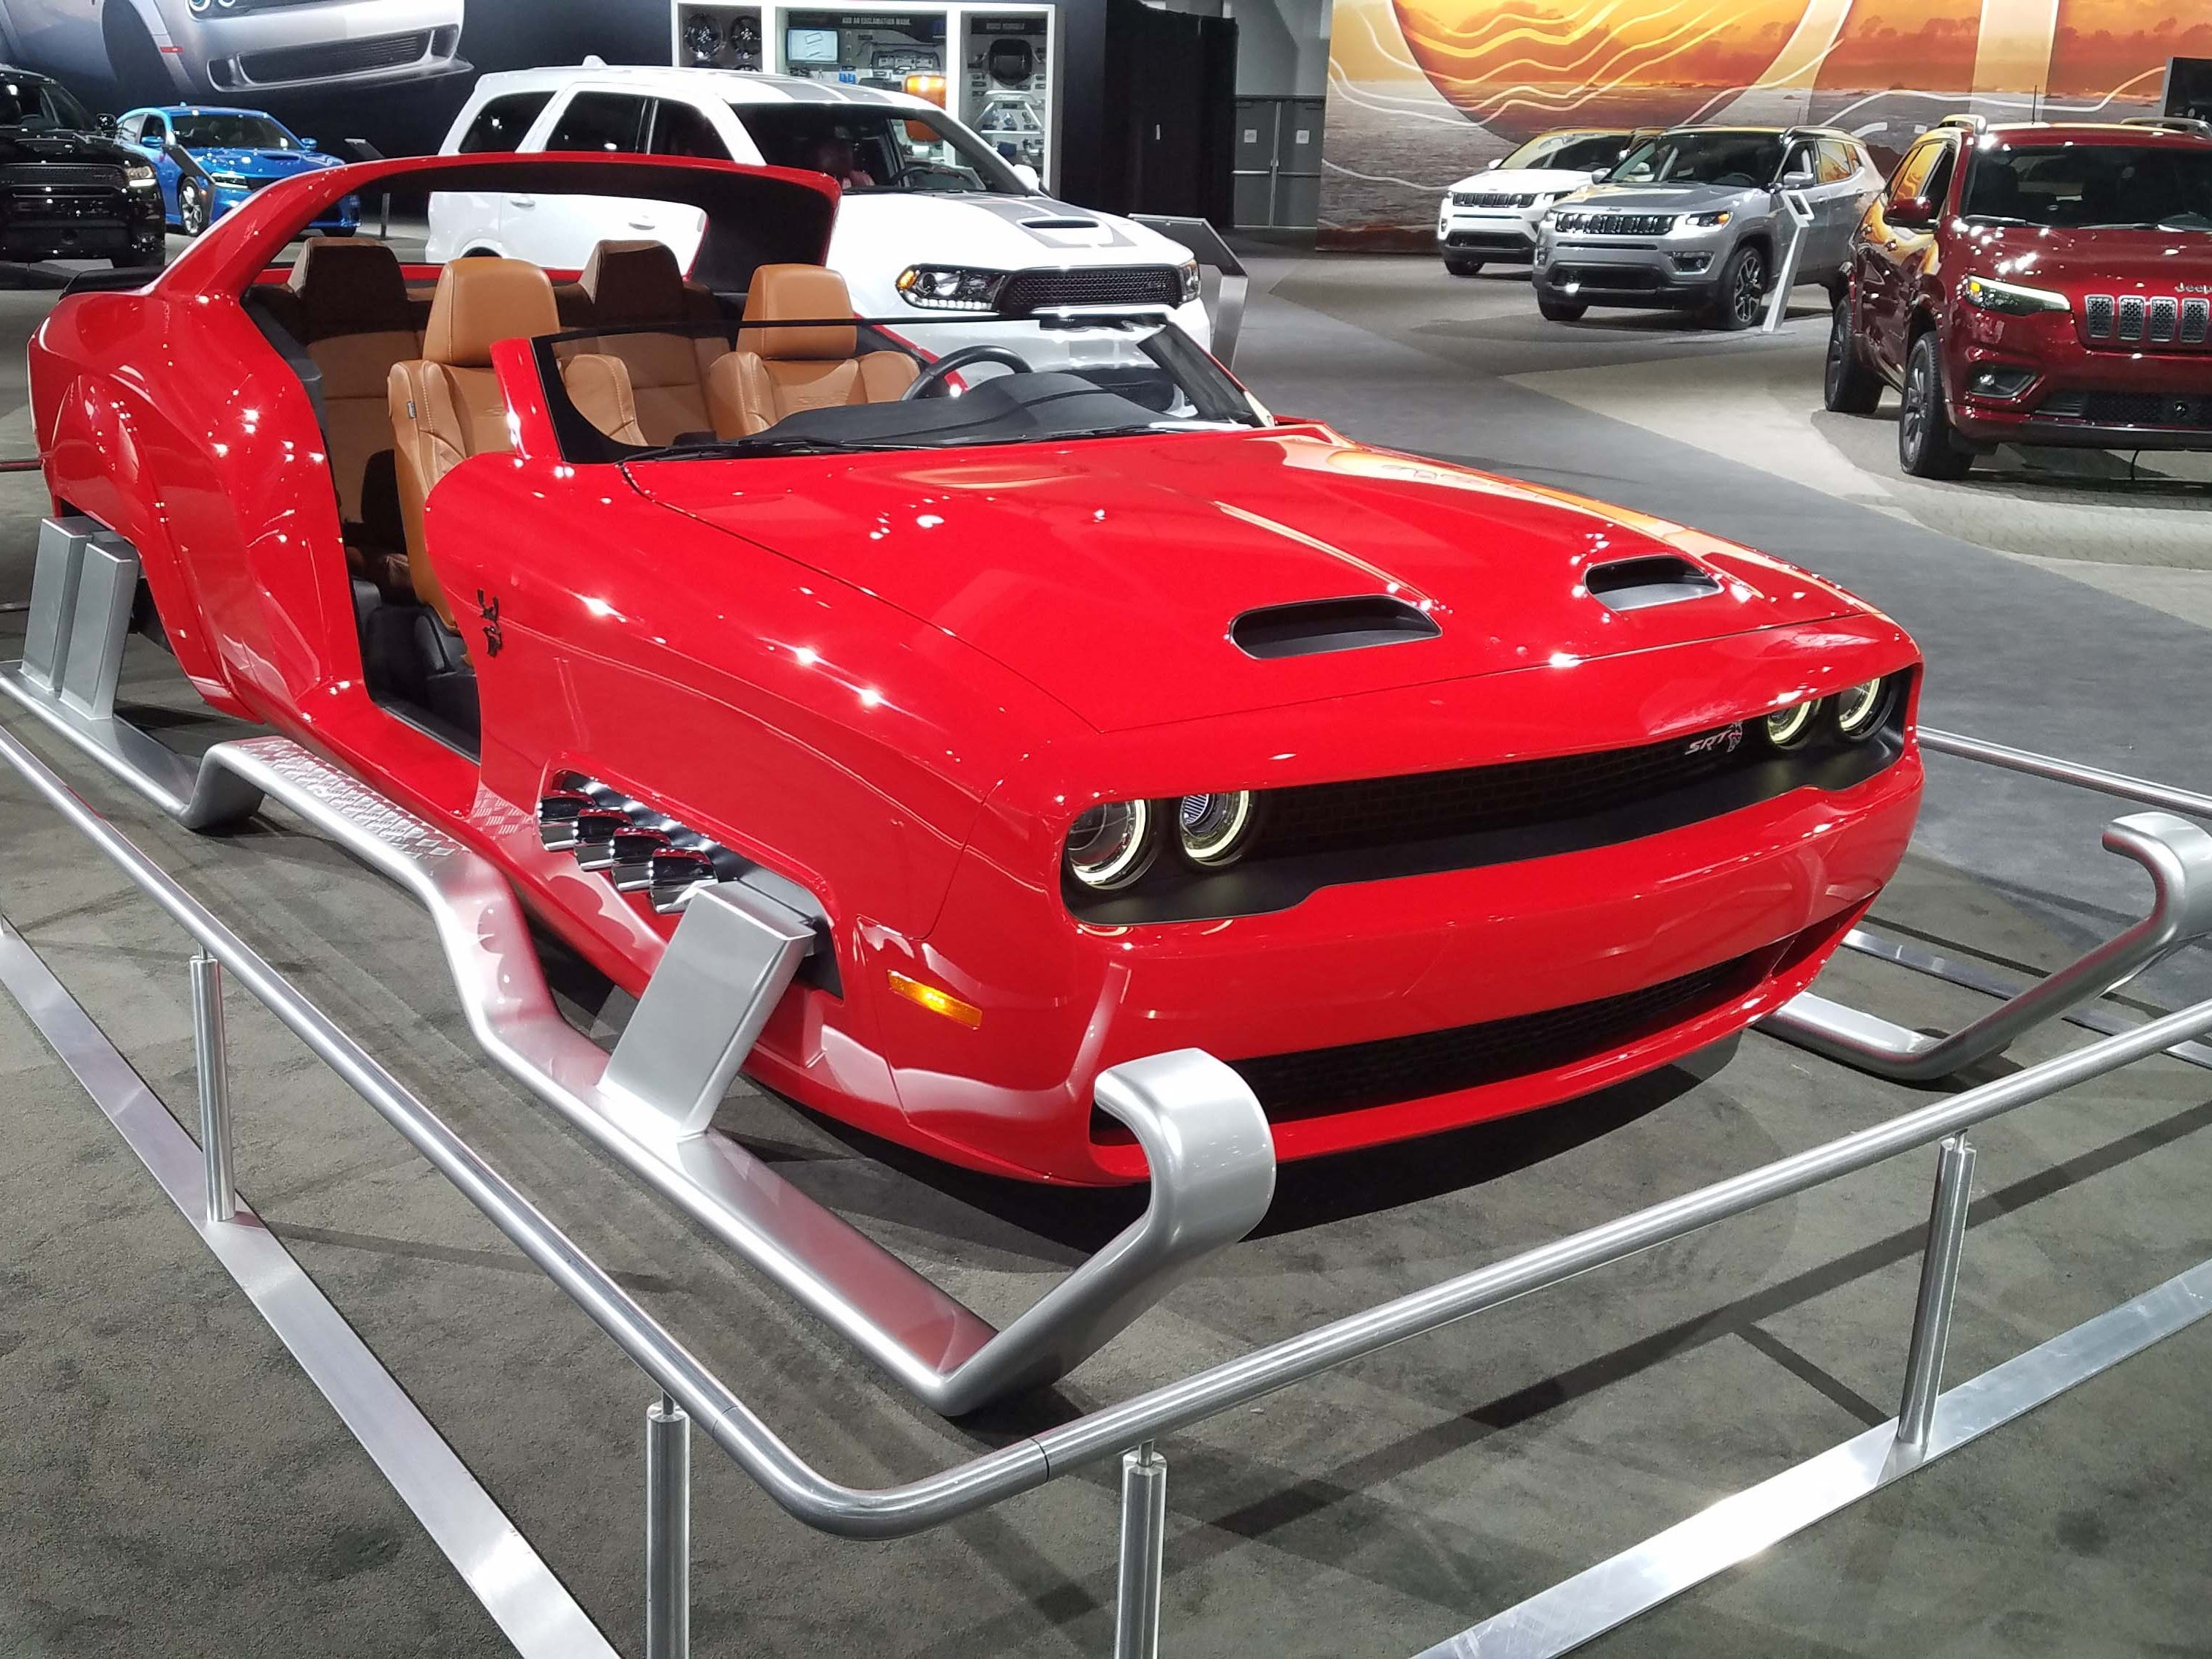 The Dodge Challenger Hellcat Redeye sleigh is Santa's dream sled.